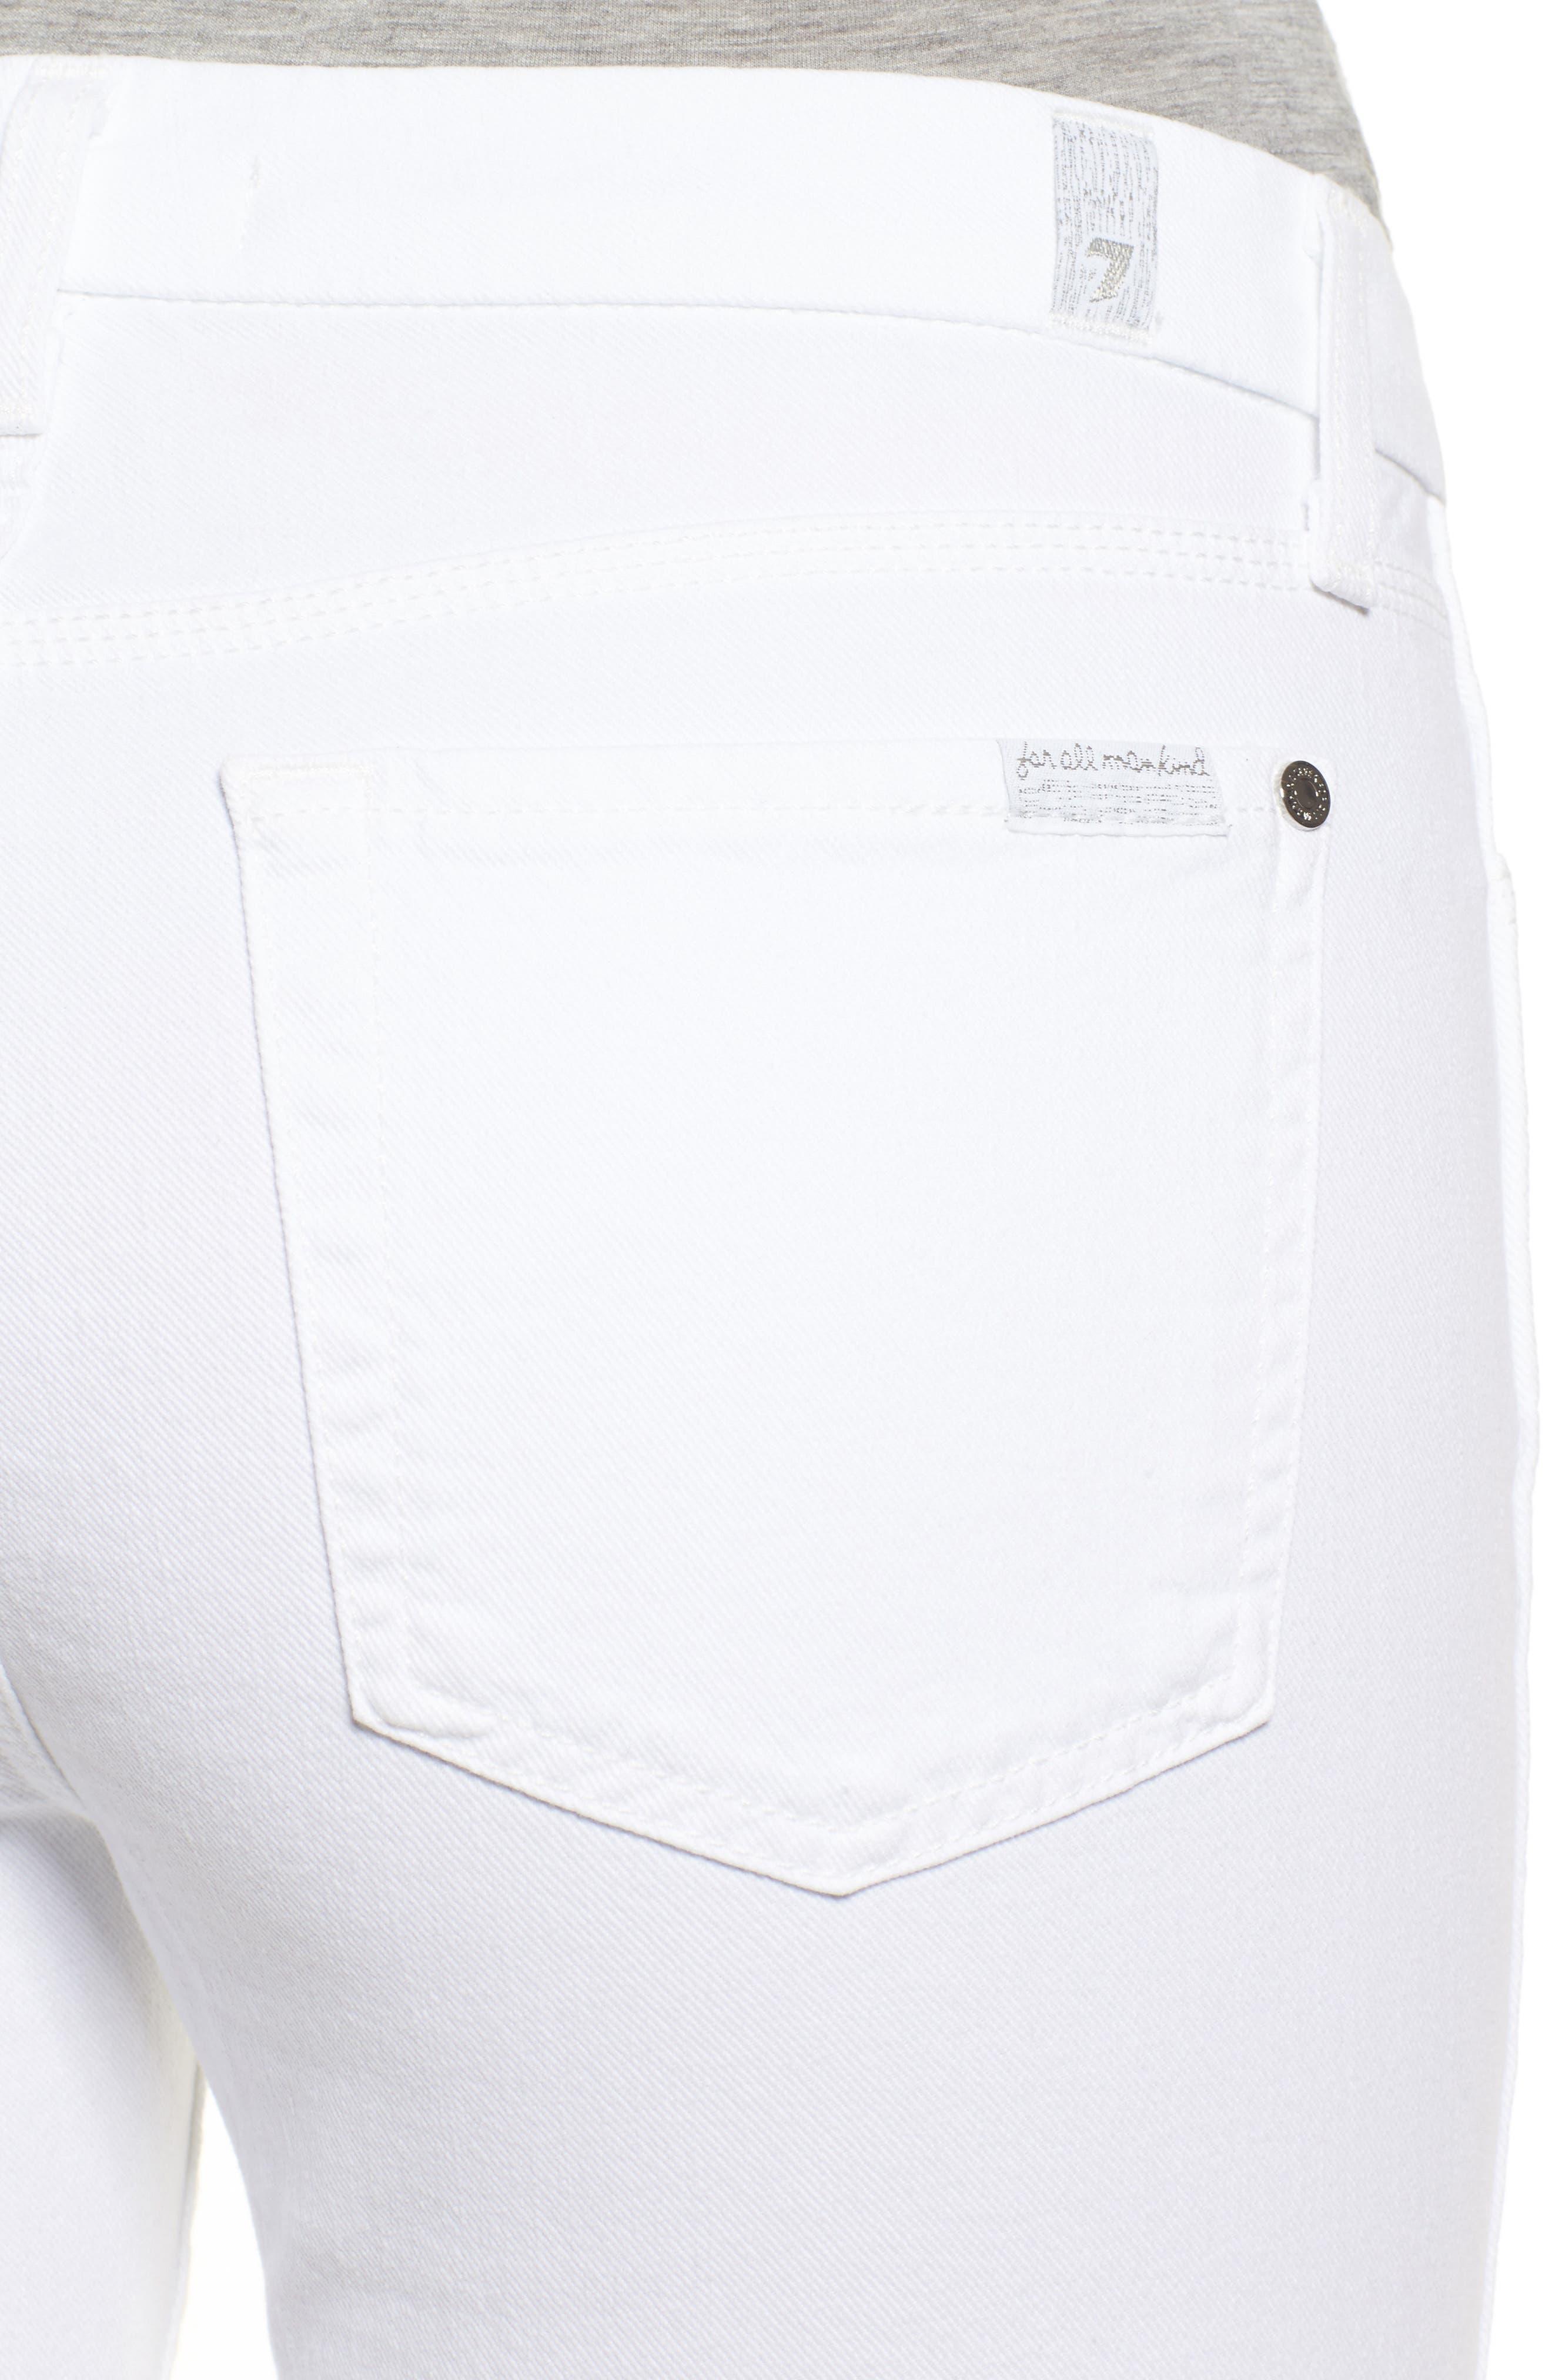 Fashion Boyfriend Raw Cuffed Jeans,                             Alternate thumbnail 4, color,                             White Fashion